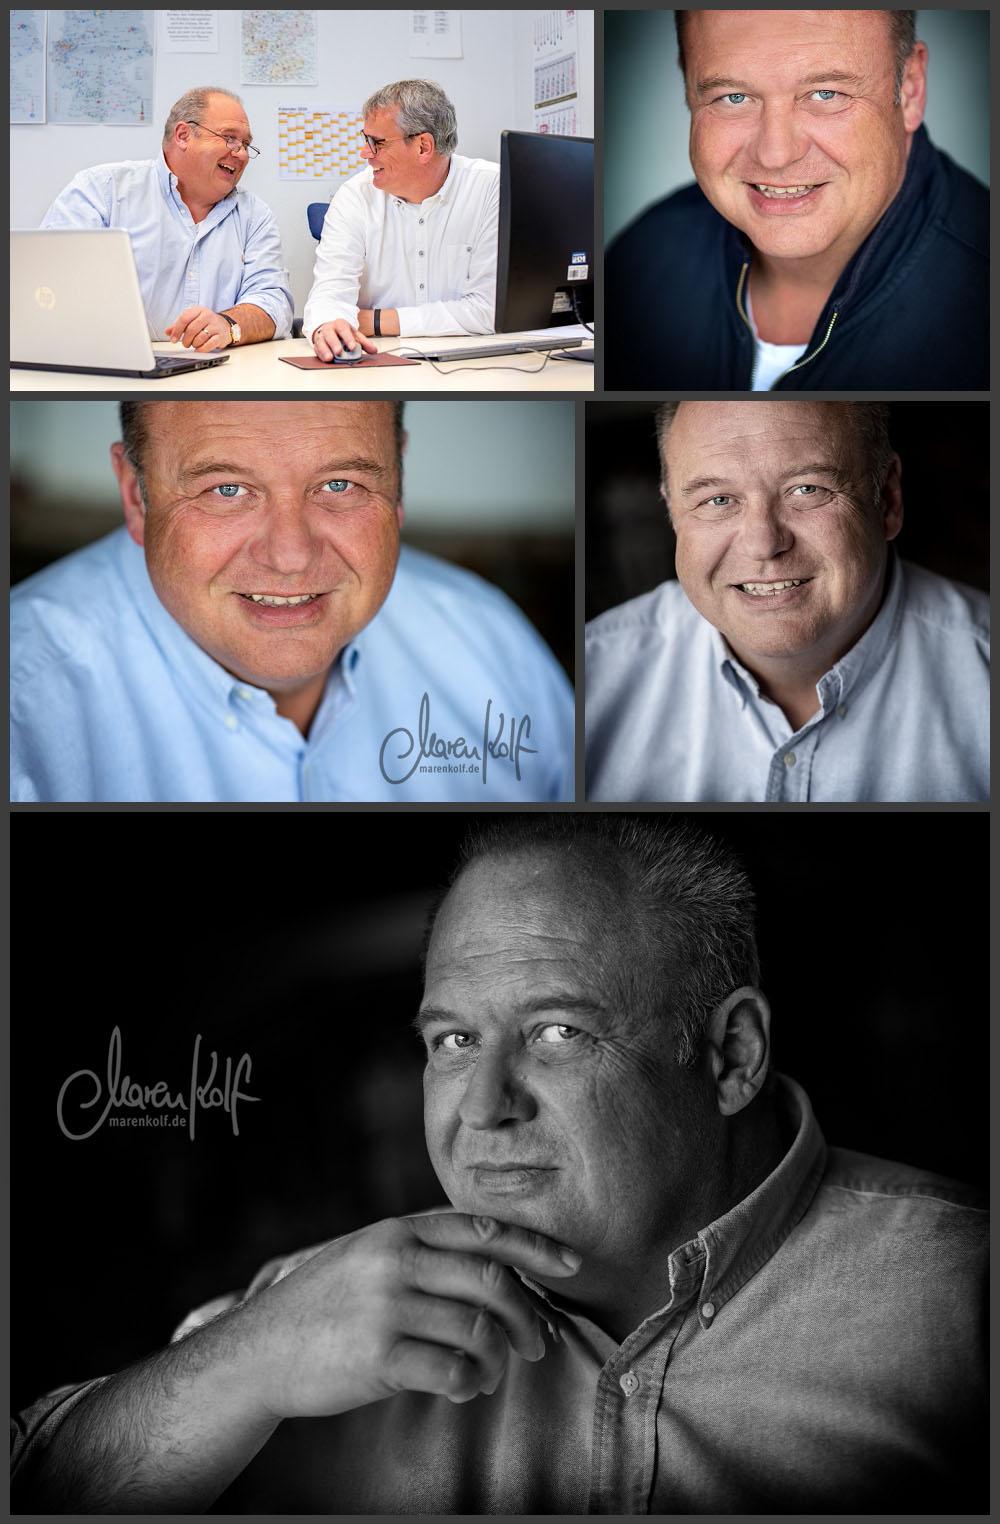 businessportraits-hannover-frank-frohme-datenschutz-cmi-compliance-maren-kolf-fotografie-wedemark-2